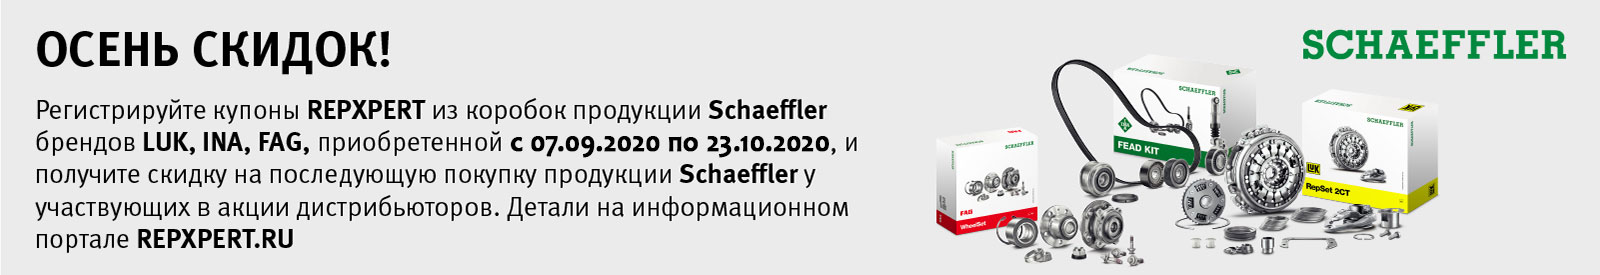 АКЦИЯ SCHAEFFLER